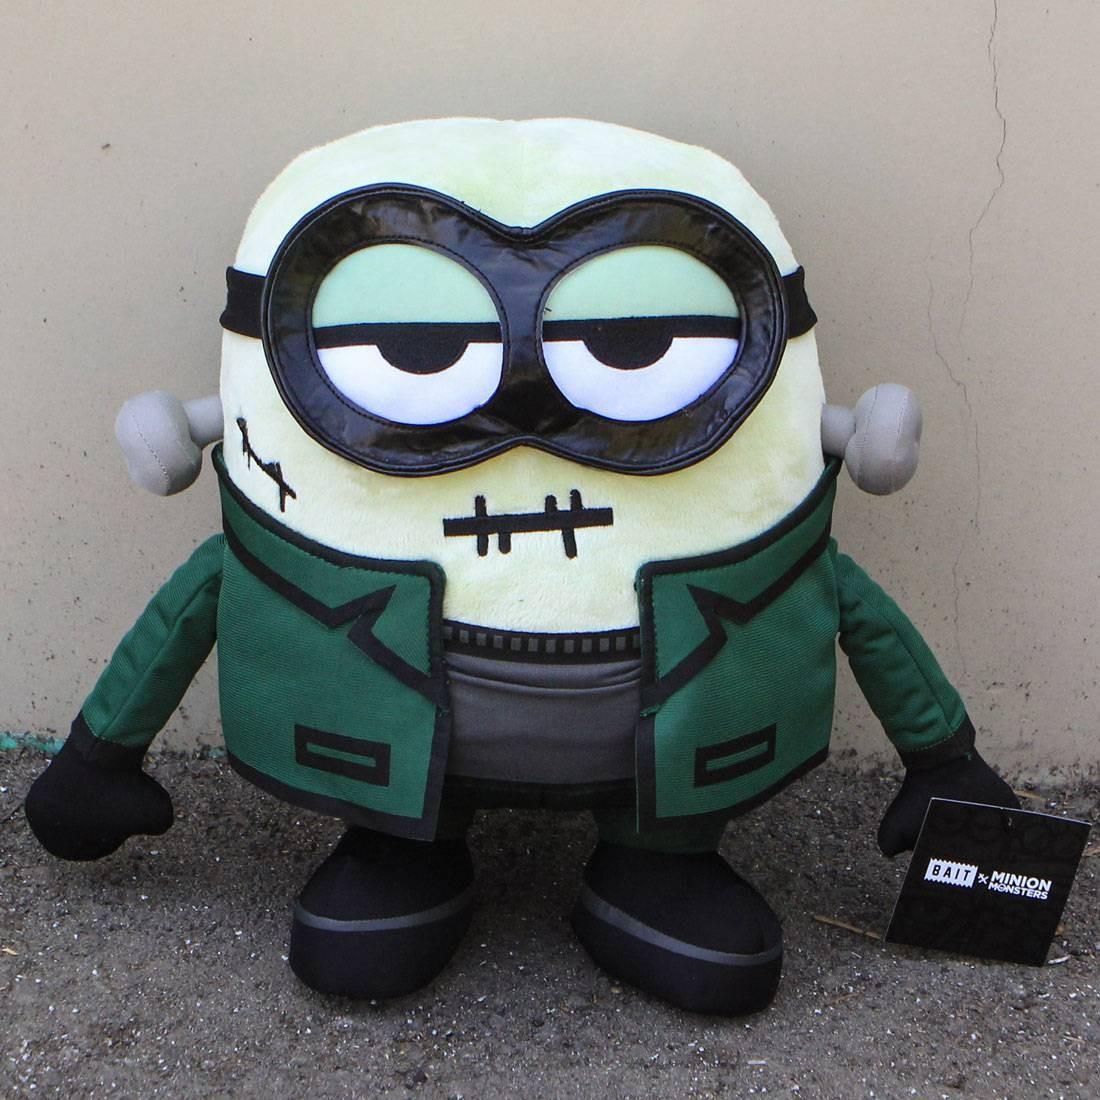 BAIT x Minion Monsters FrankenBob 12 Inch Plush (green)